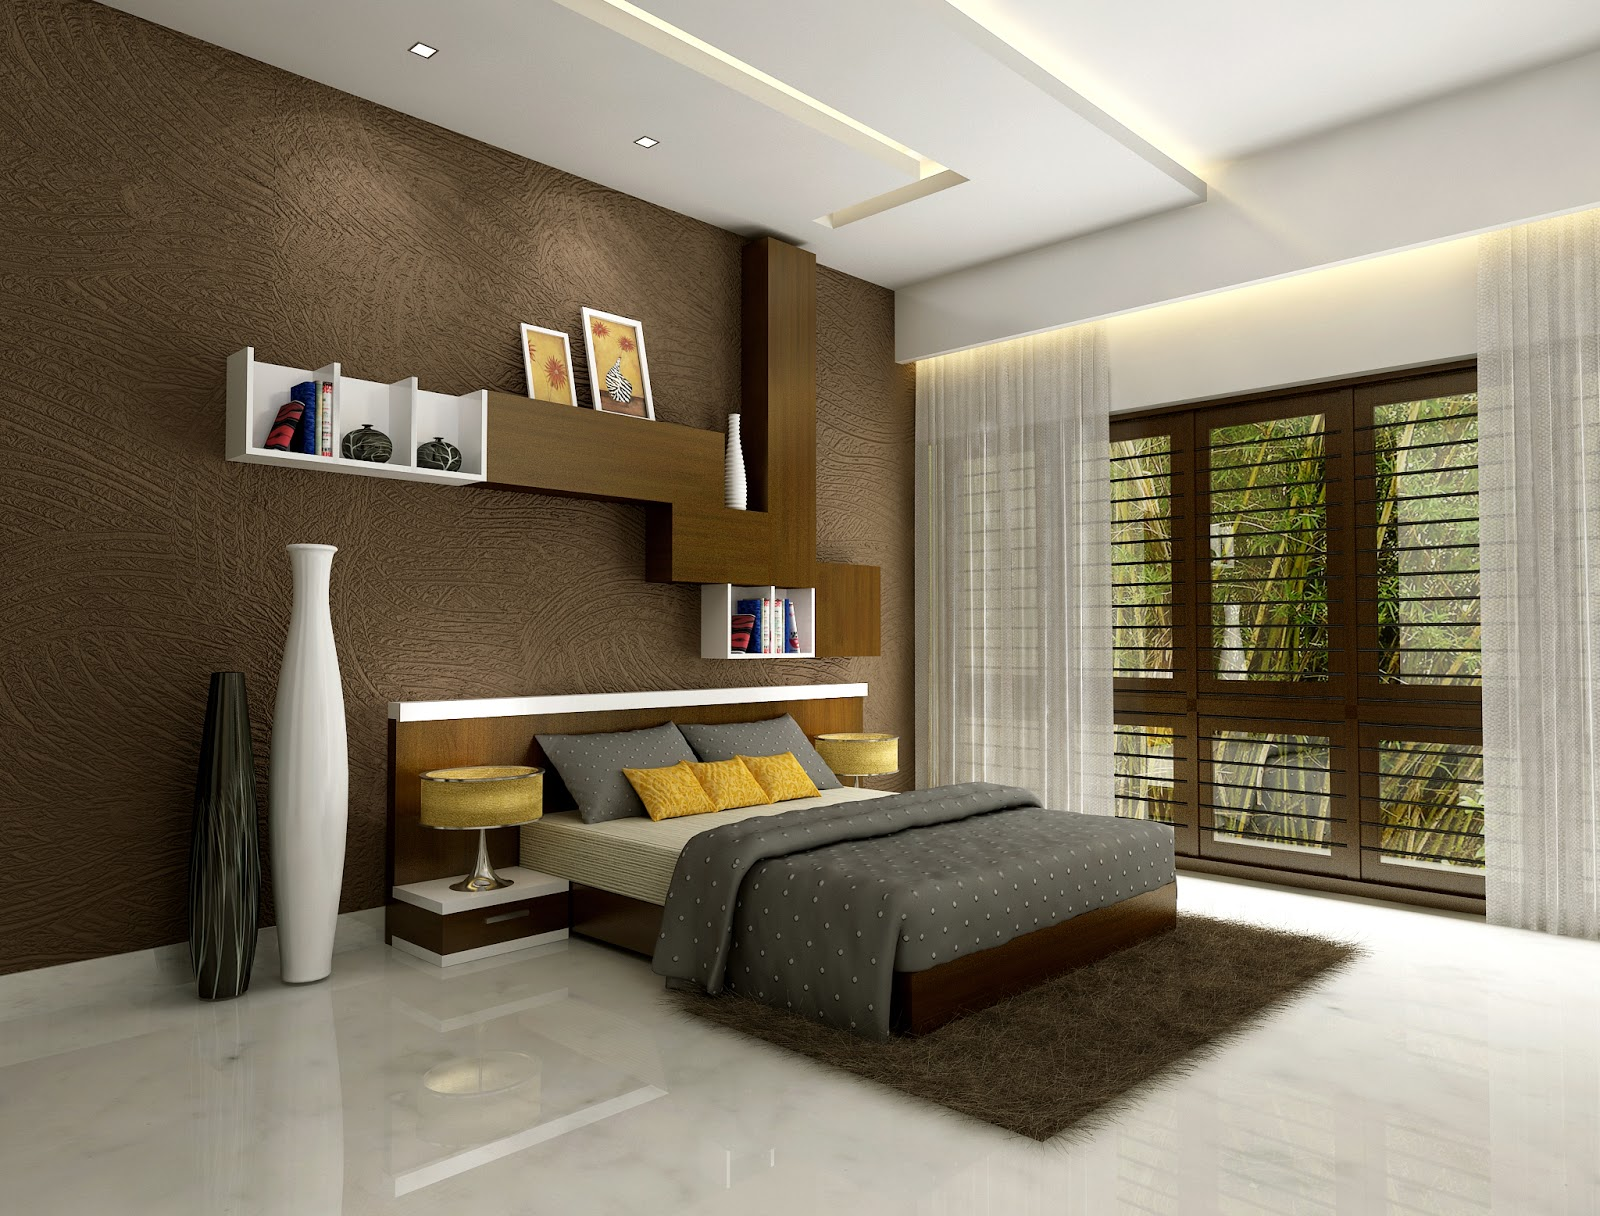 amazing Modern Bedroom Designs